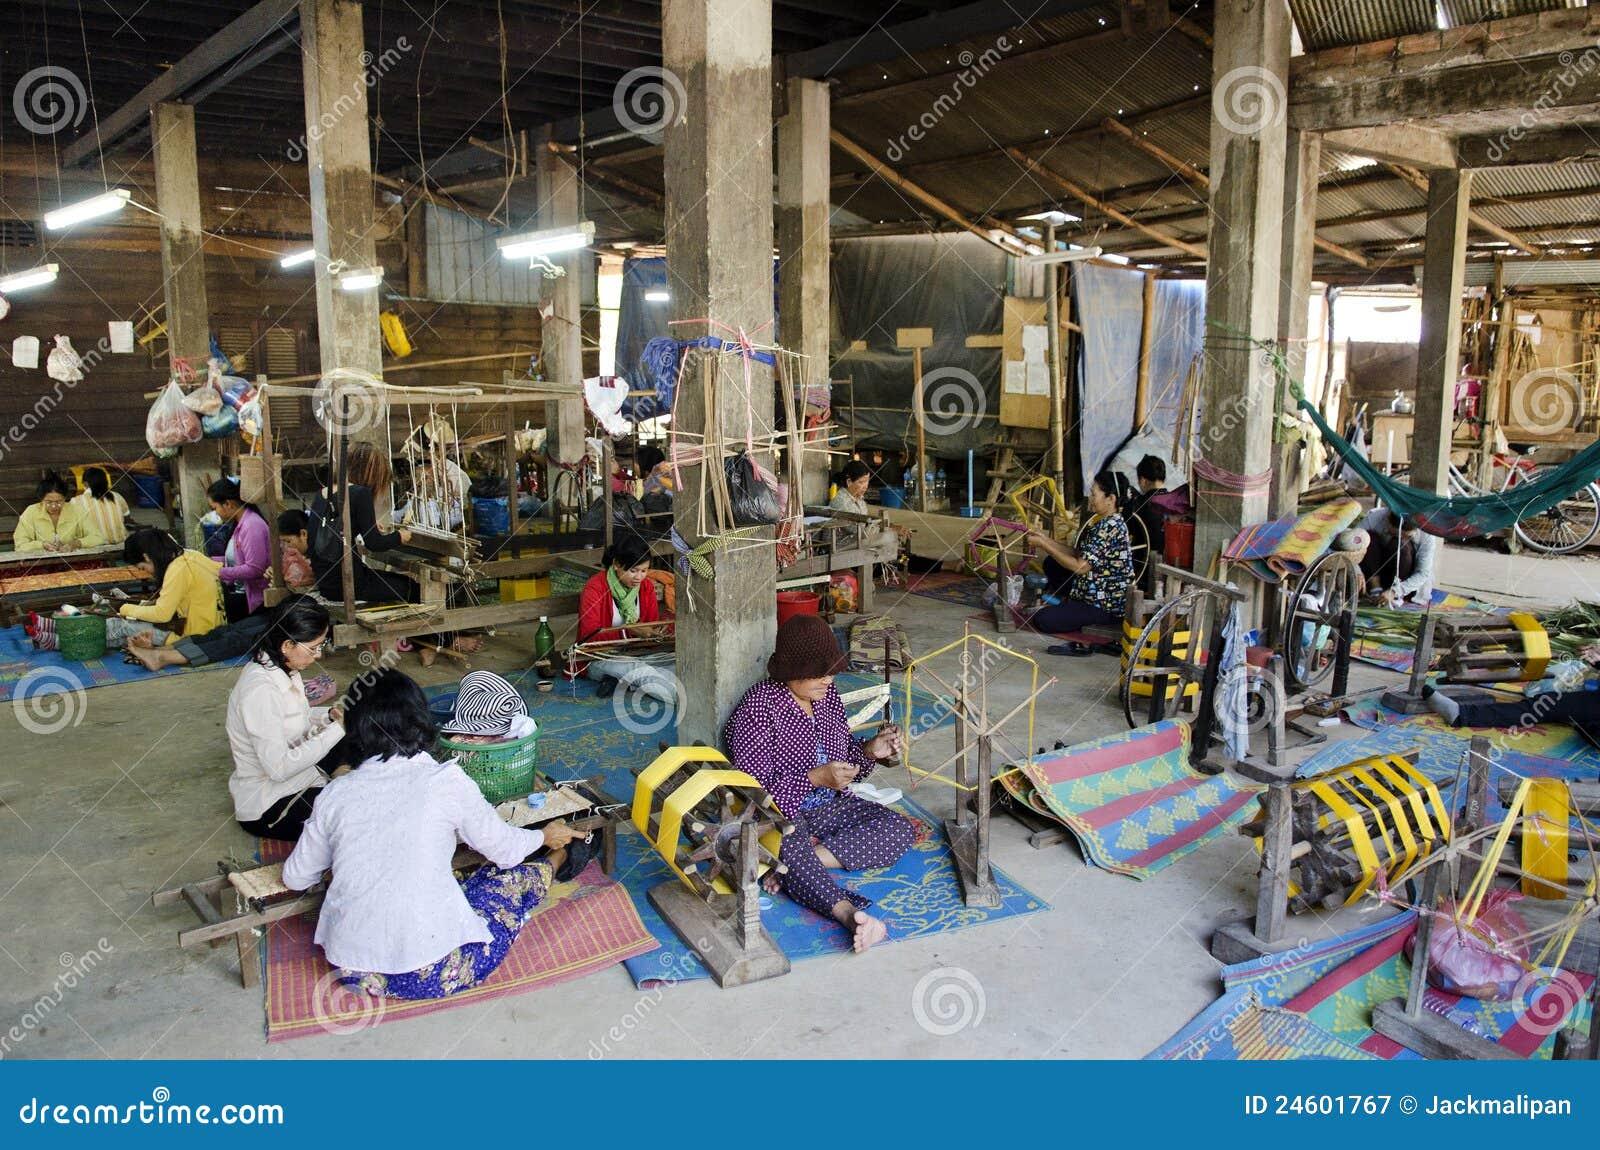 cambodia textile industry